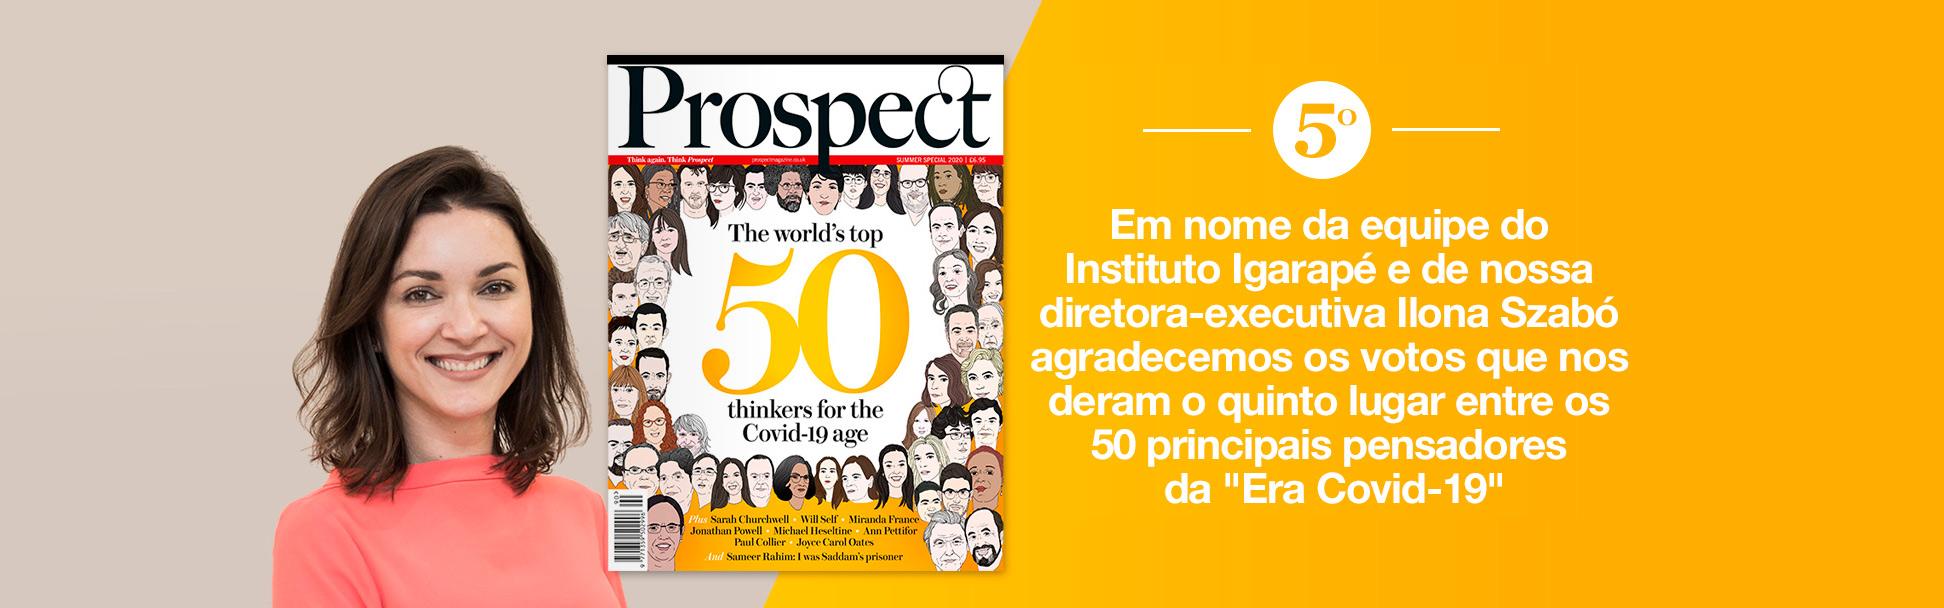 prospect-Ilona-5-top-50-banner-top